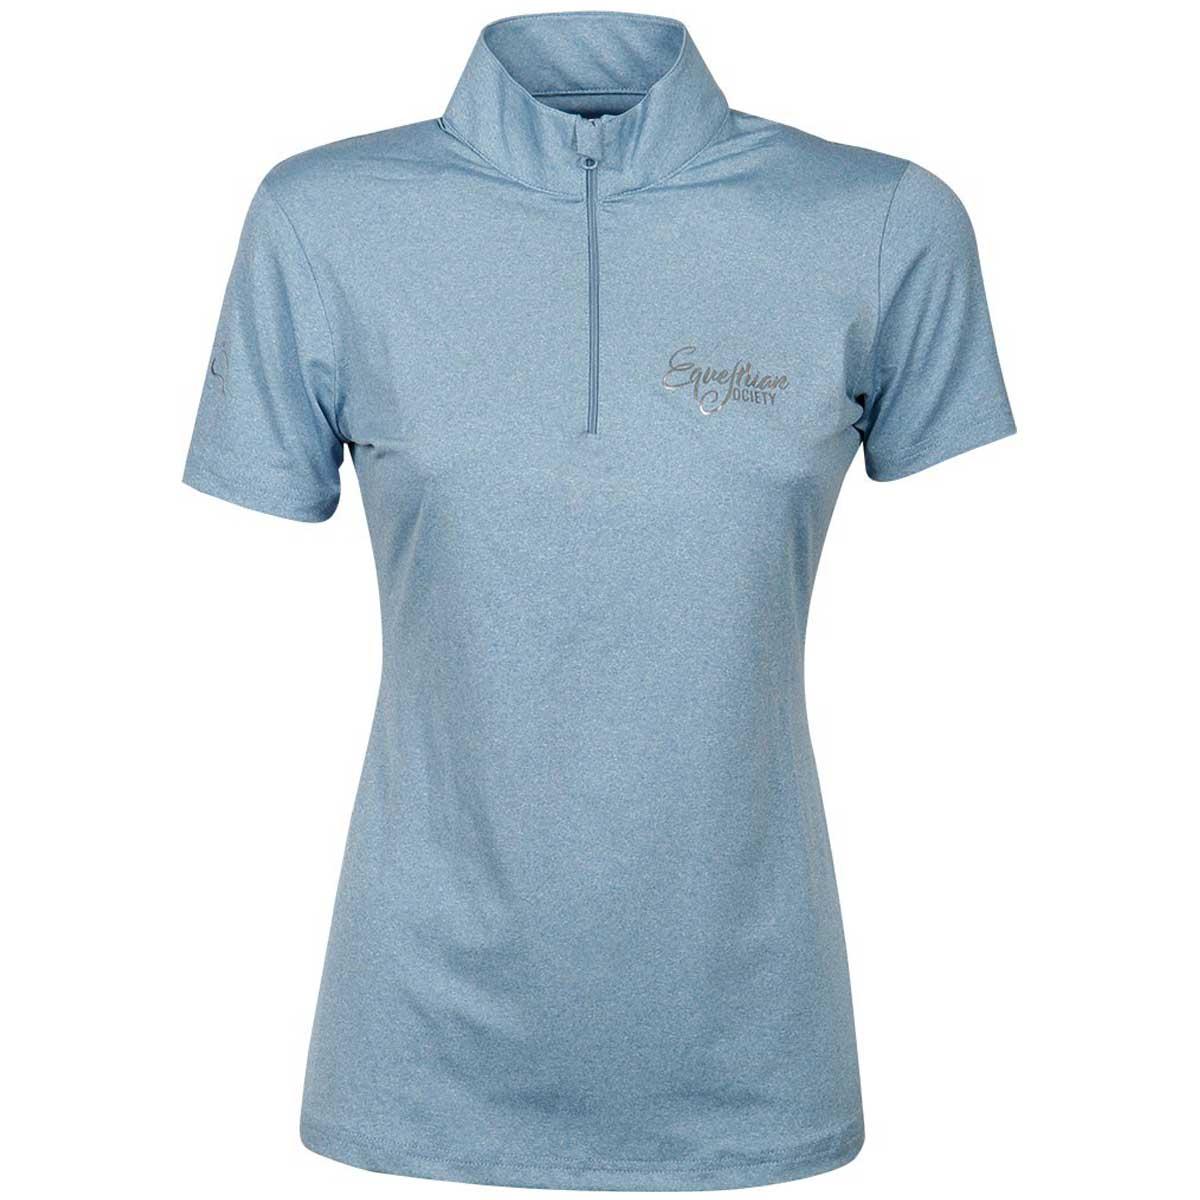 Harry's Horse Harding Techshirt lichtblauw maat:m